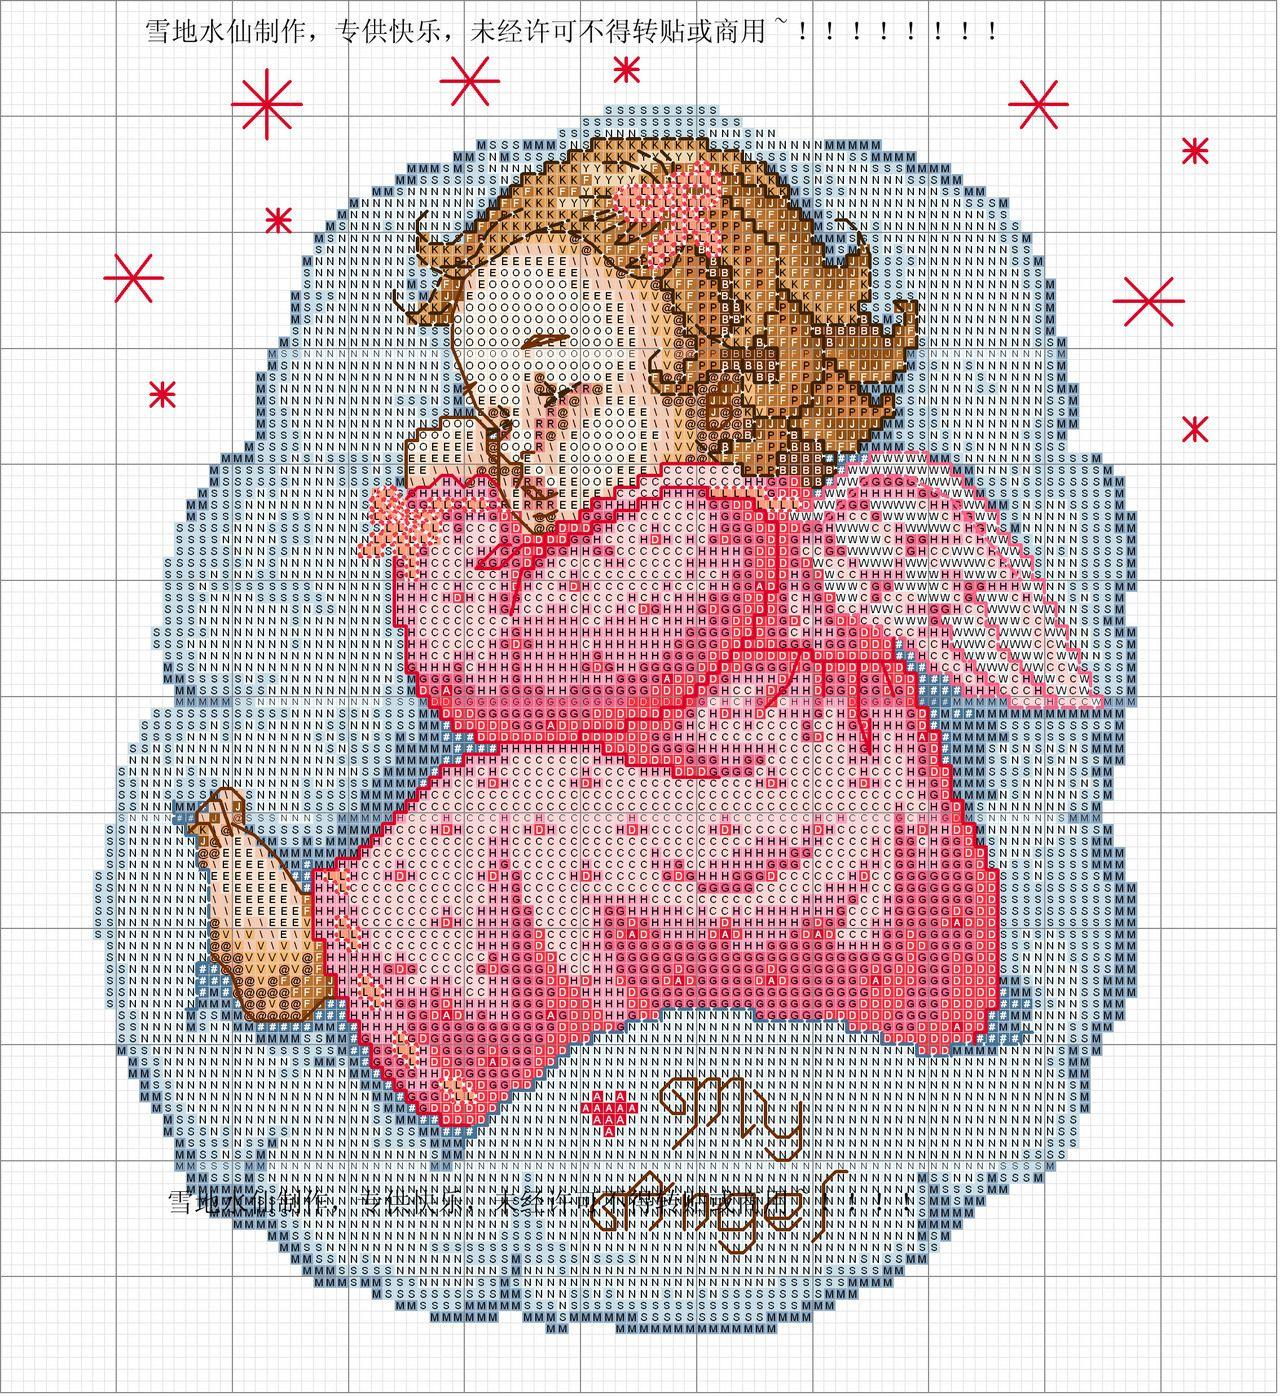 Lilla 39 s gifs dividers angeli angels anges for Immagini punto croce per bambini